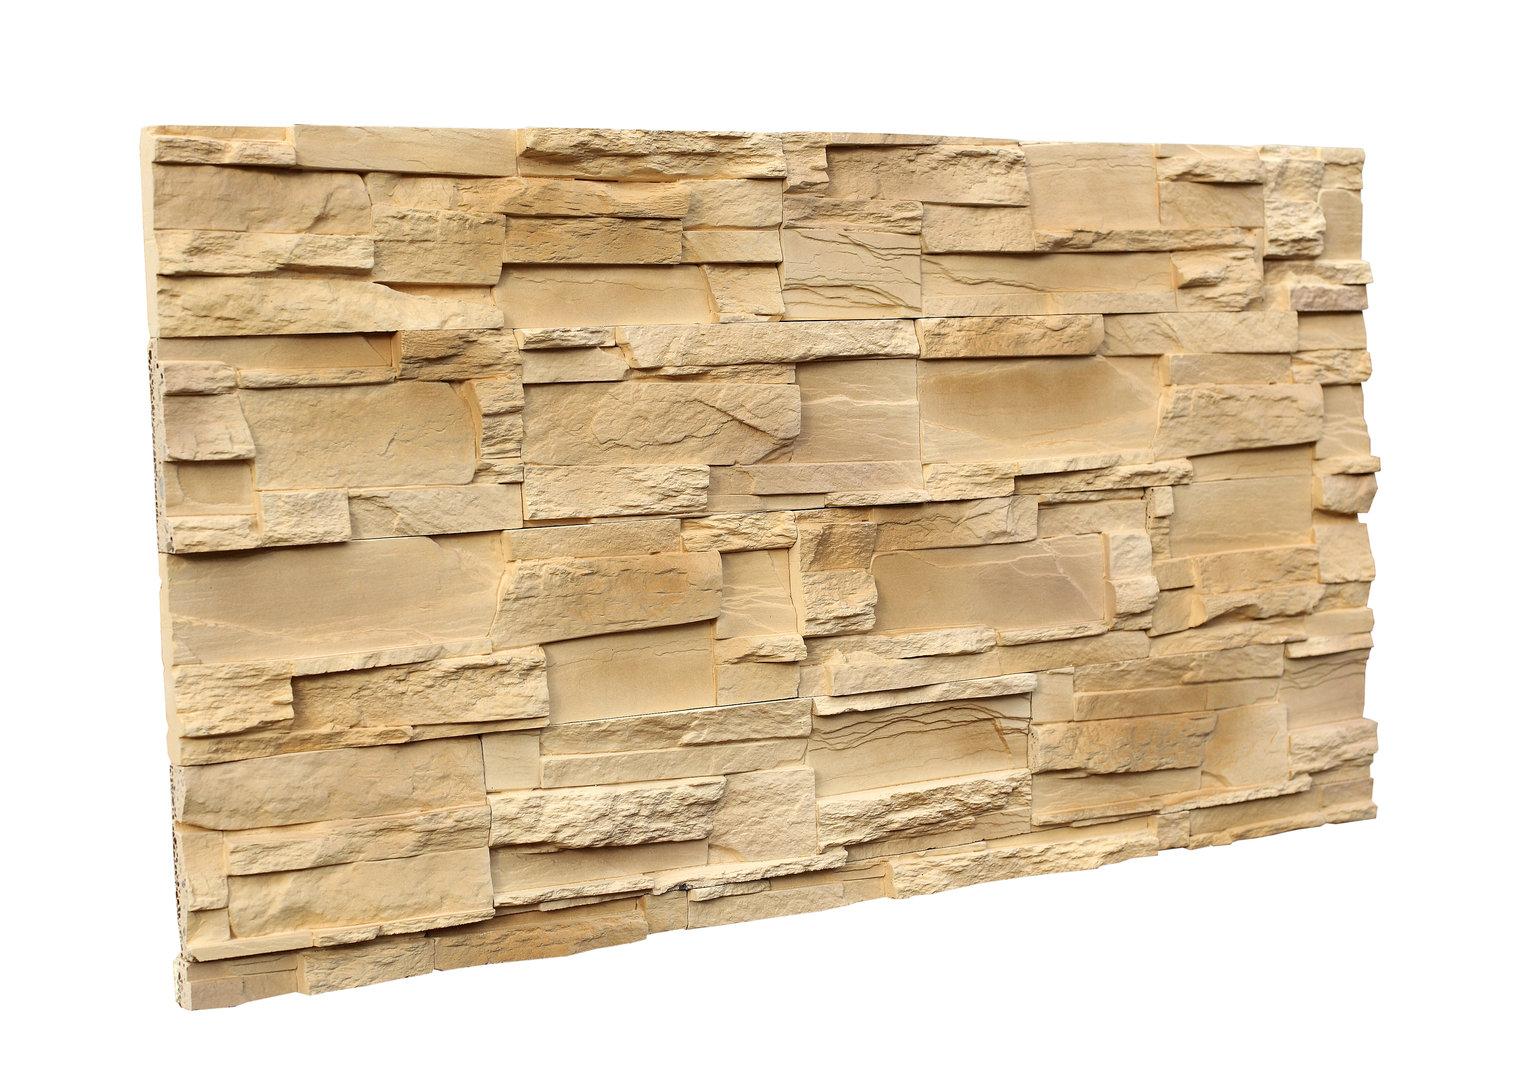 Alpine Sand Corner -Exterior Stone Veneer, Stacked Stone Cladding